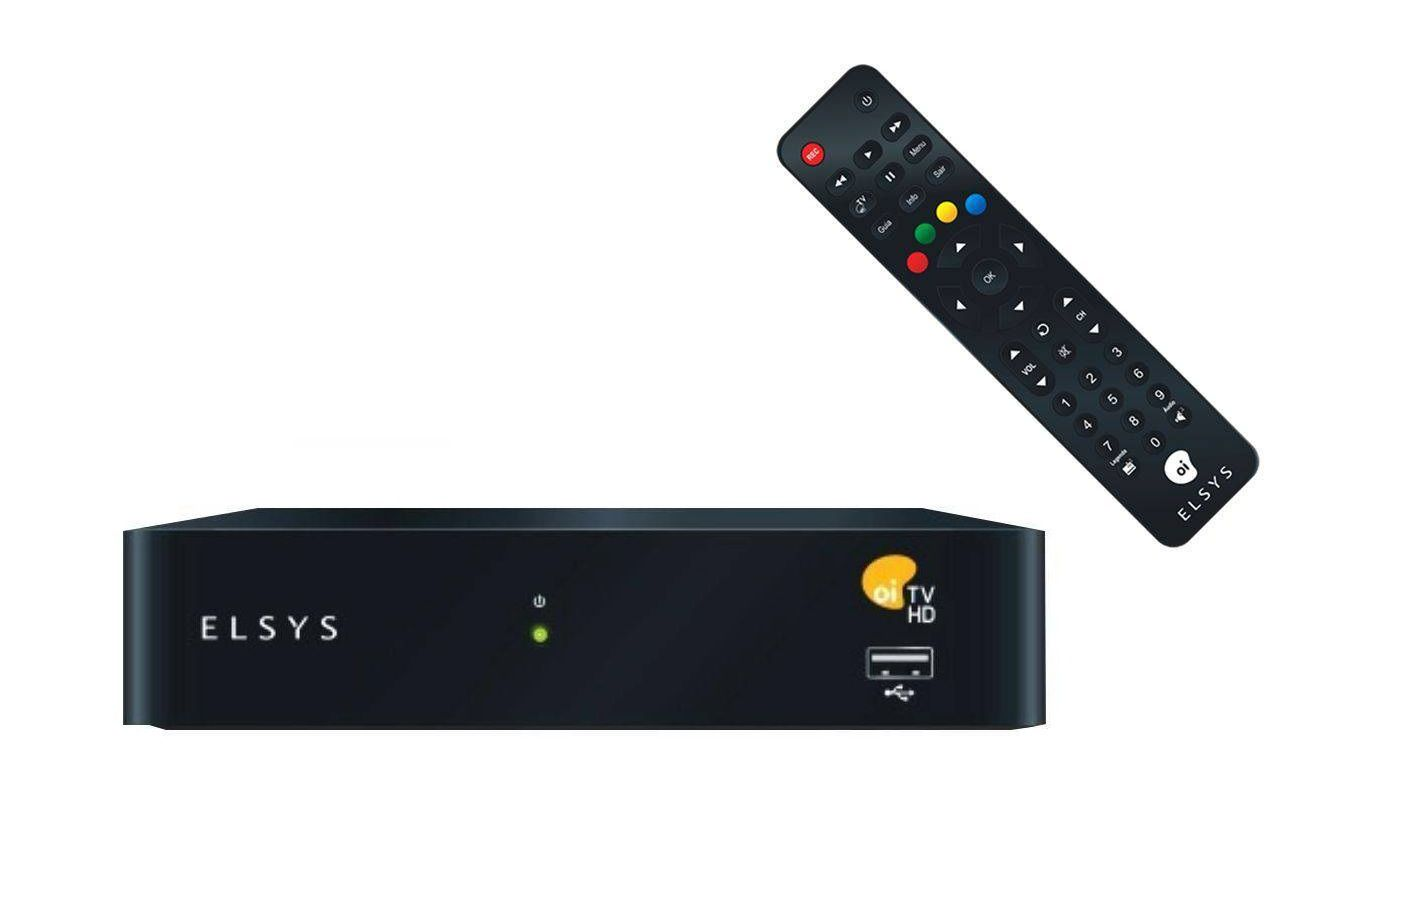 Receptor Digital Elsys Oi TV Hd Etrs44 + Super Brinde